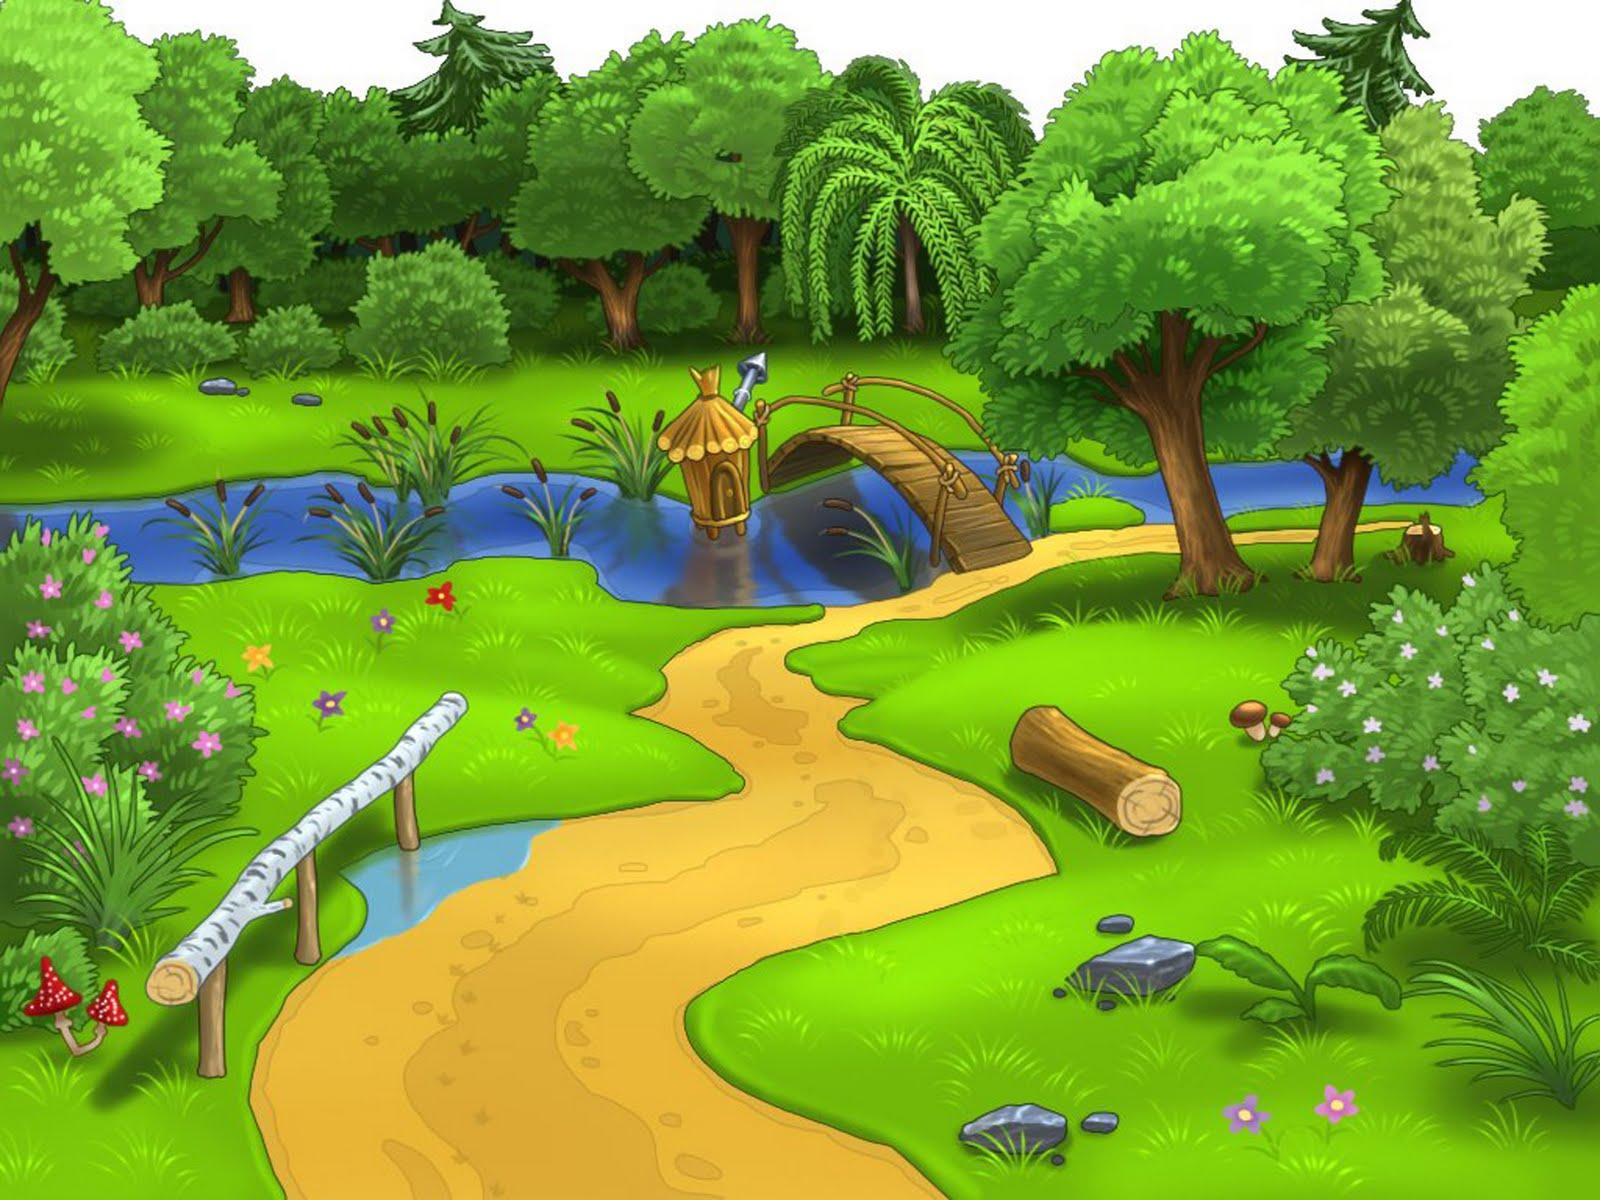 Ver imagenes de paisajes imagenes de paisajes animados for Buscar imagenes de fondo de pantalla